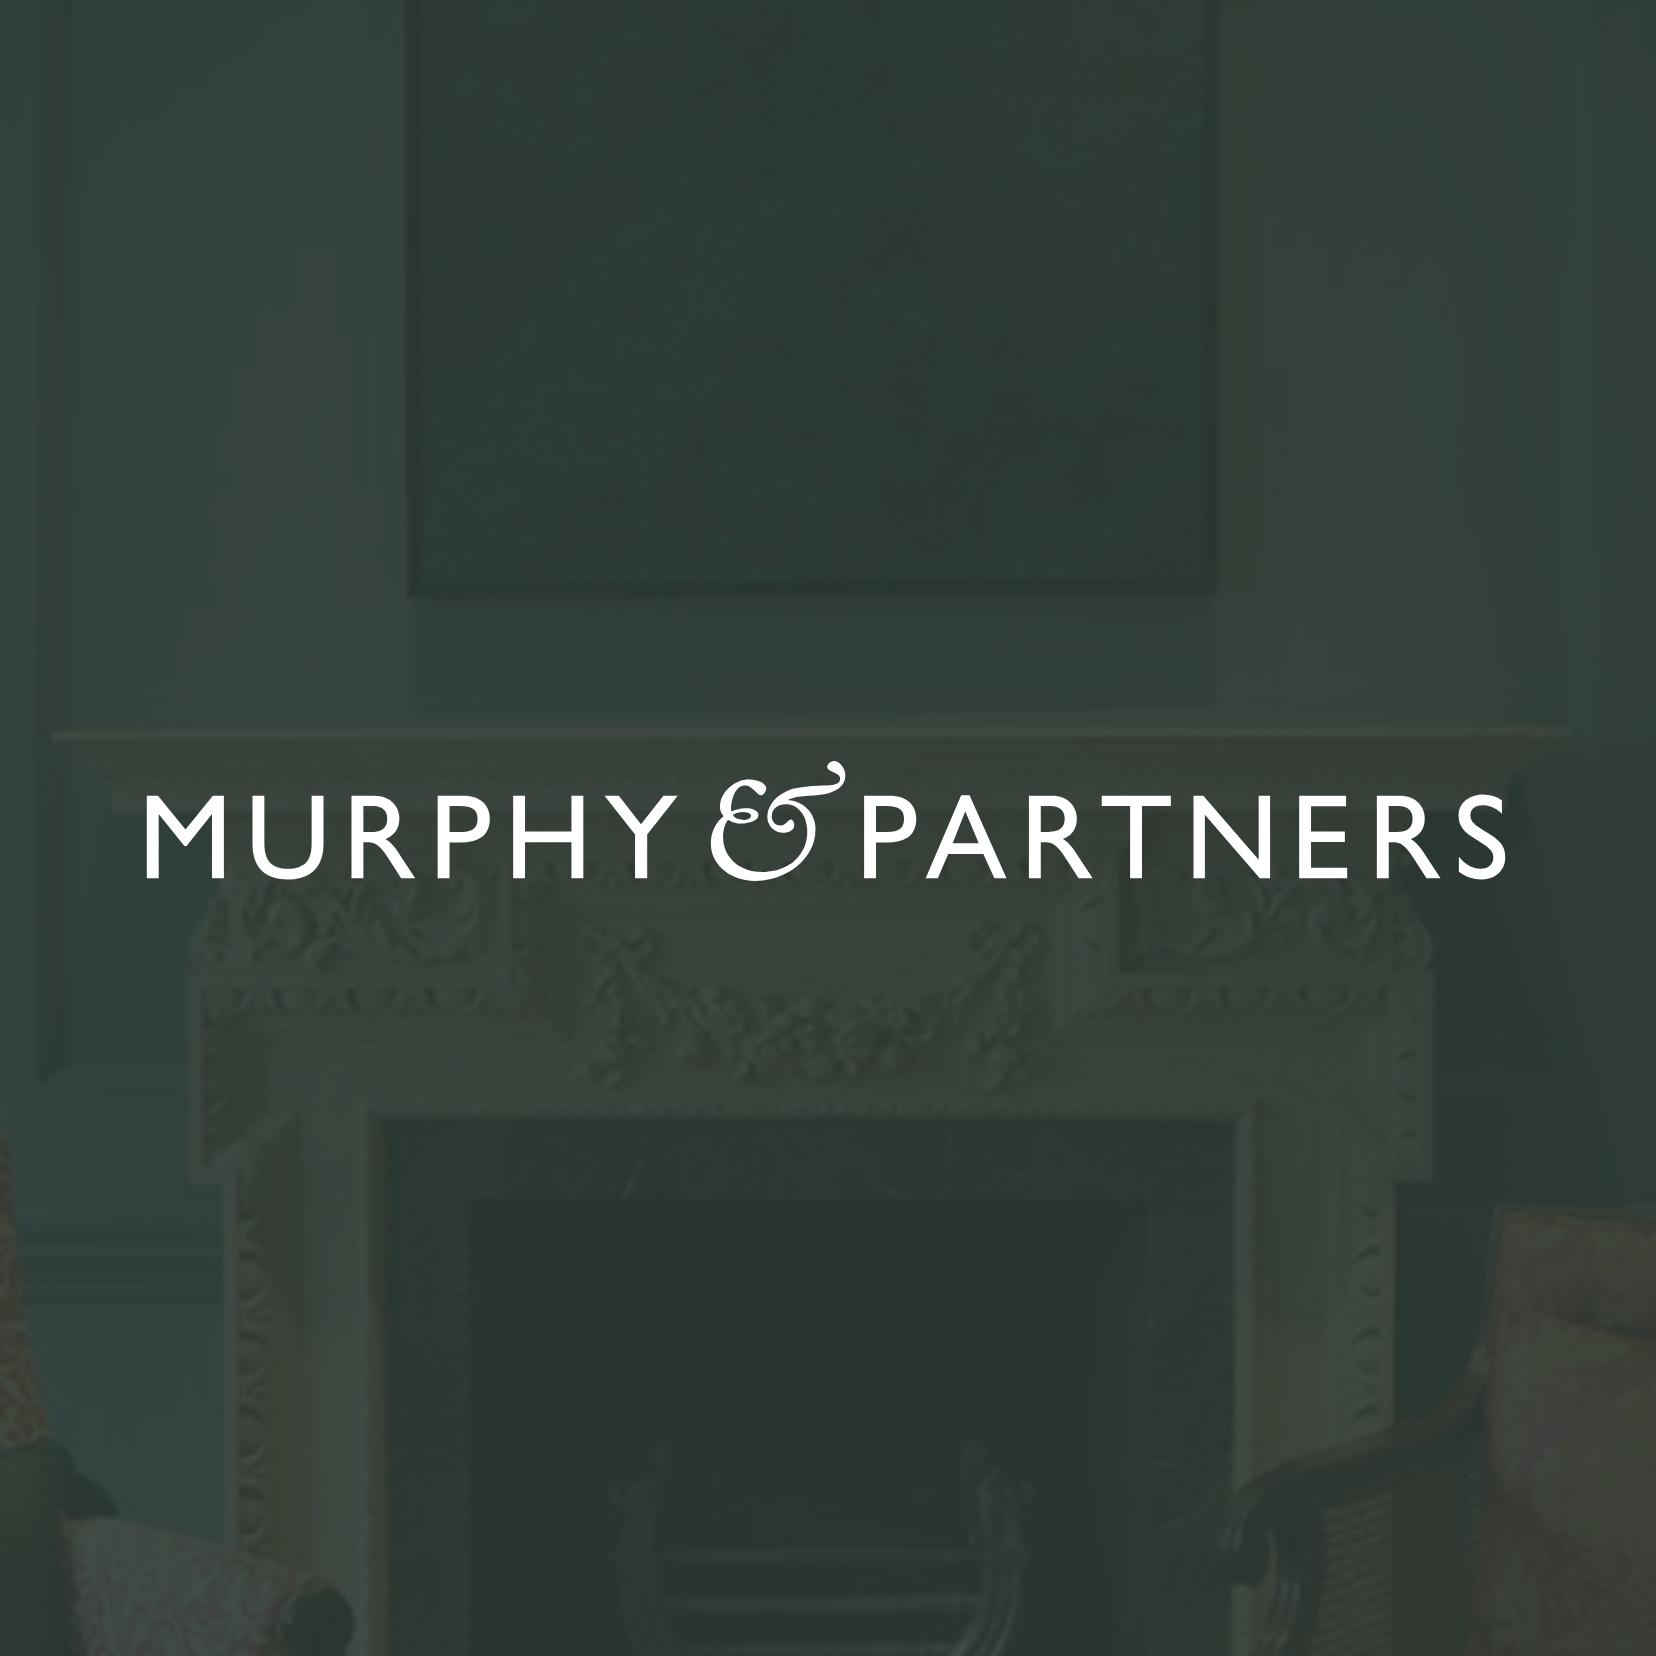 Murphy Partners